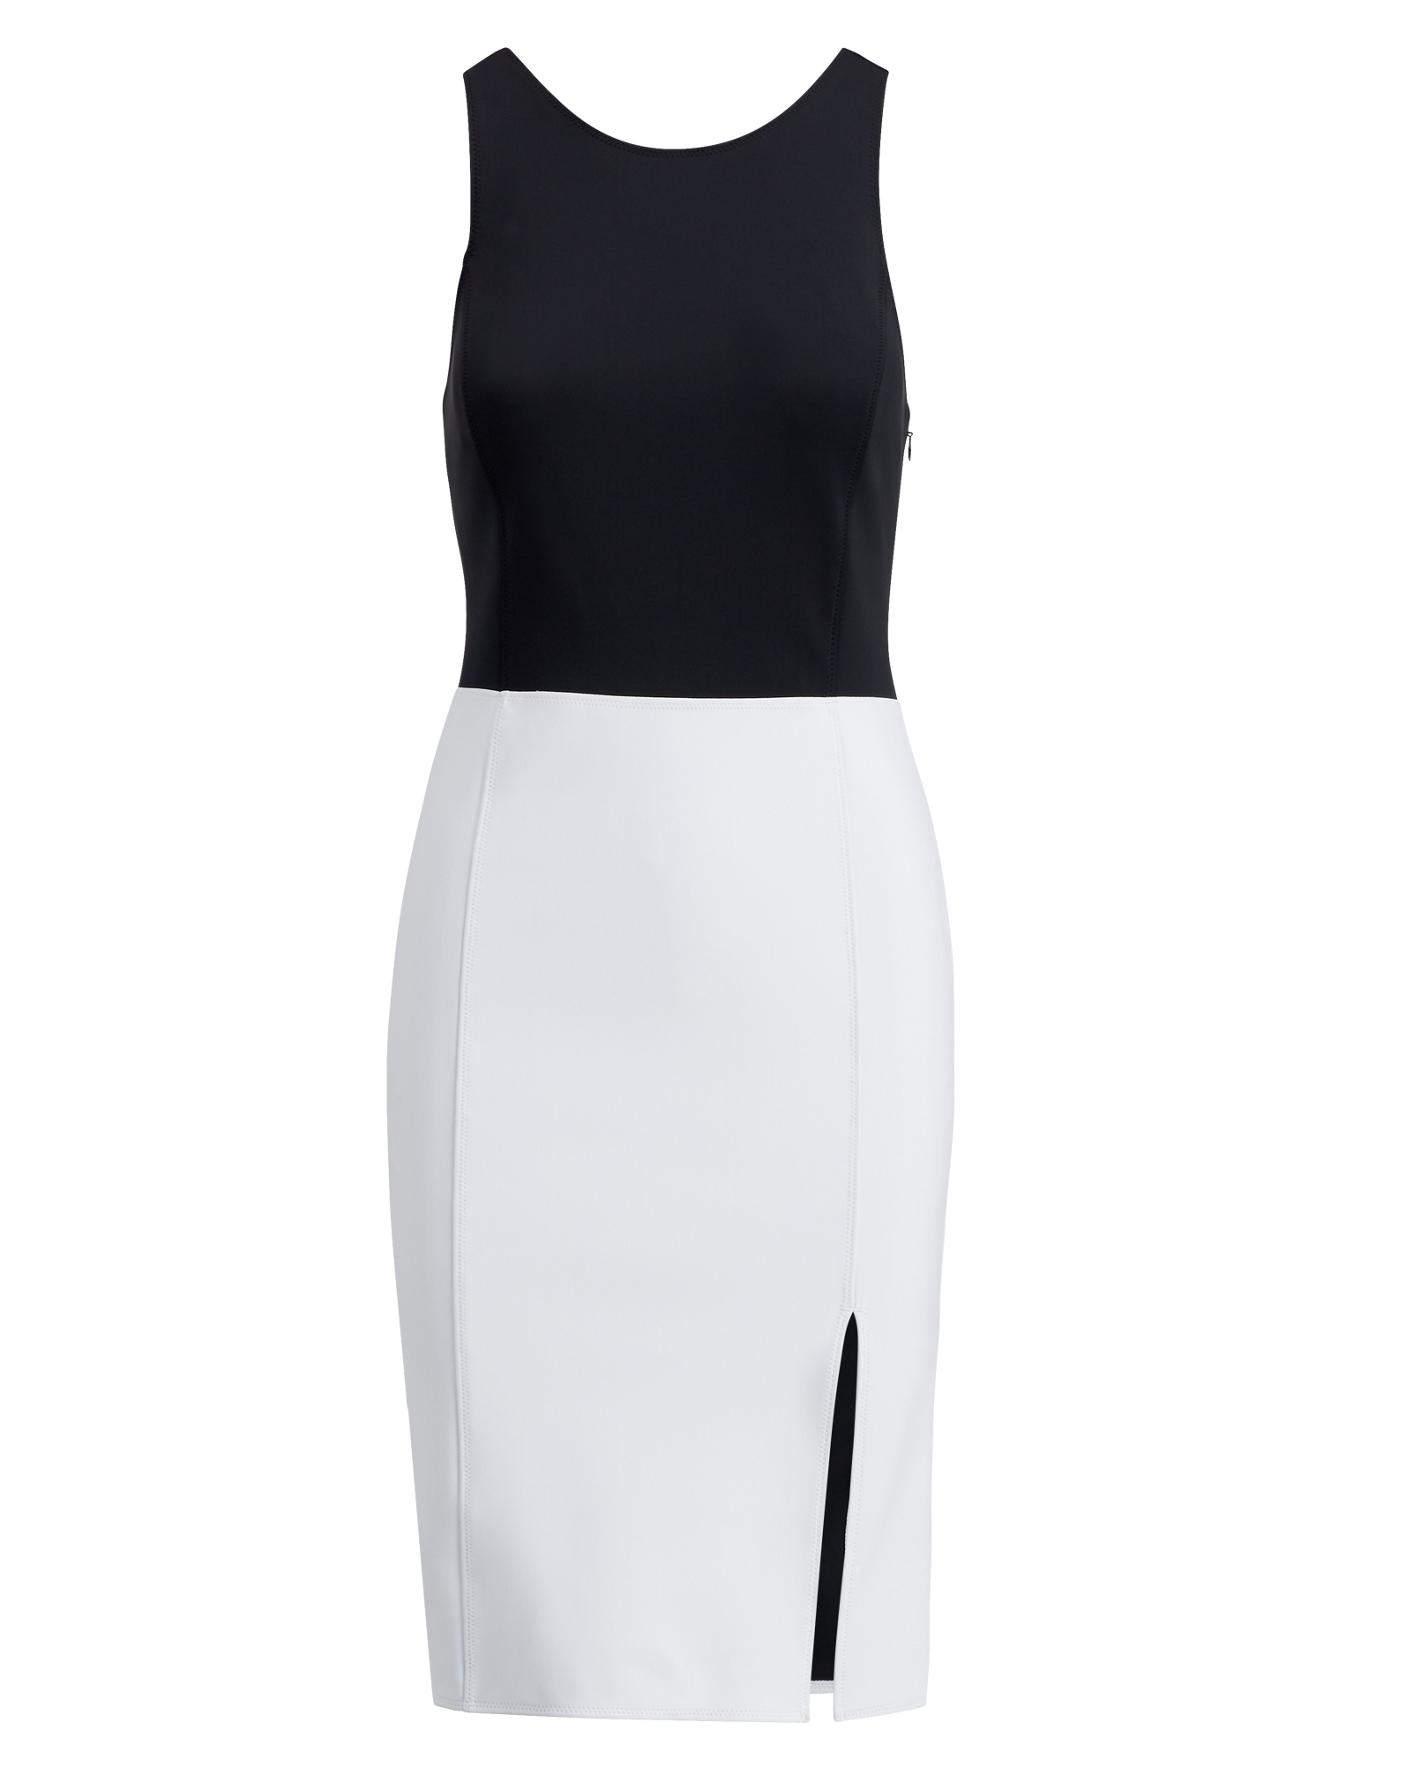 White dress cocktail - Two Tone Sleeveless Dress Polo Ralph Lauren Midi Ralphlauren Com